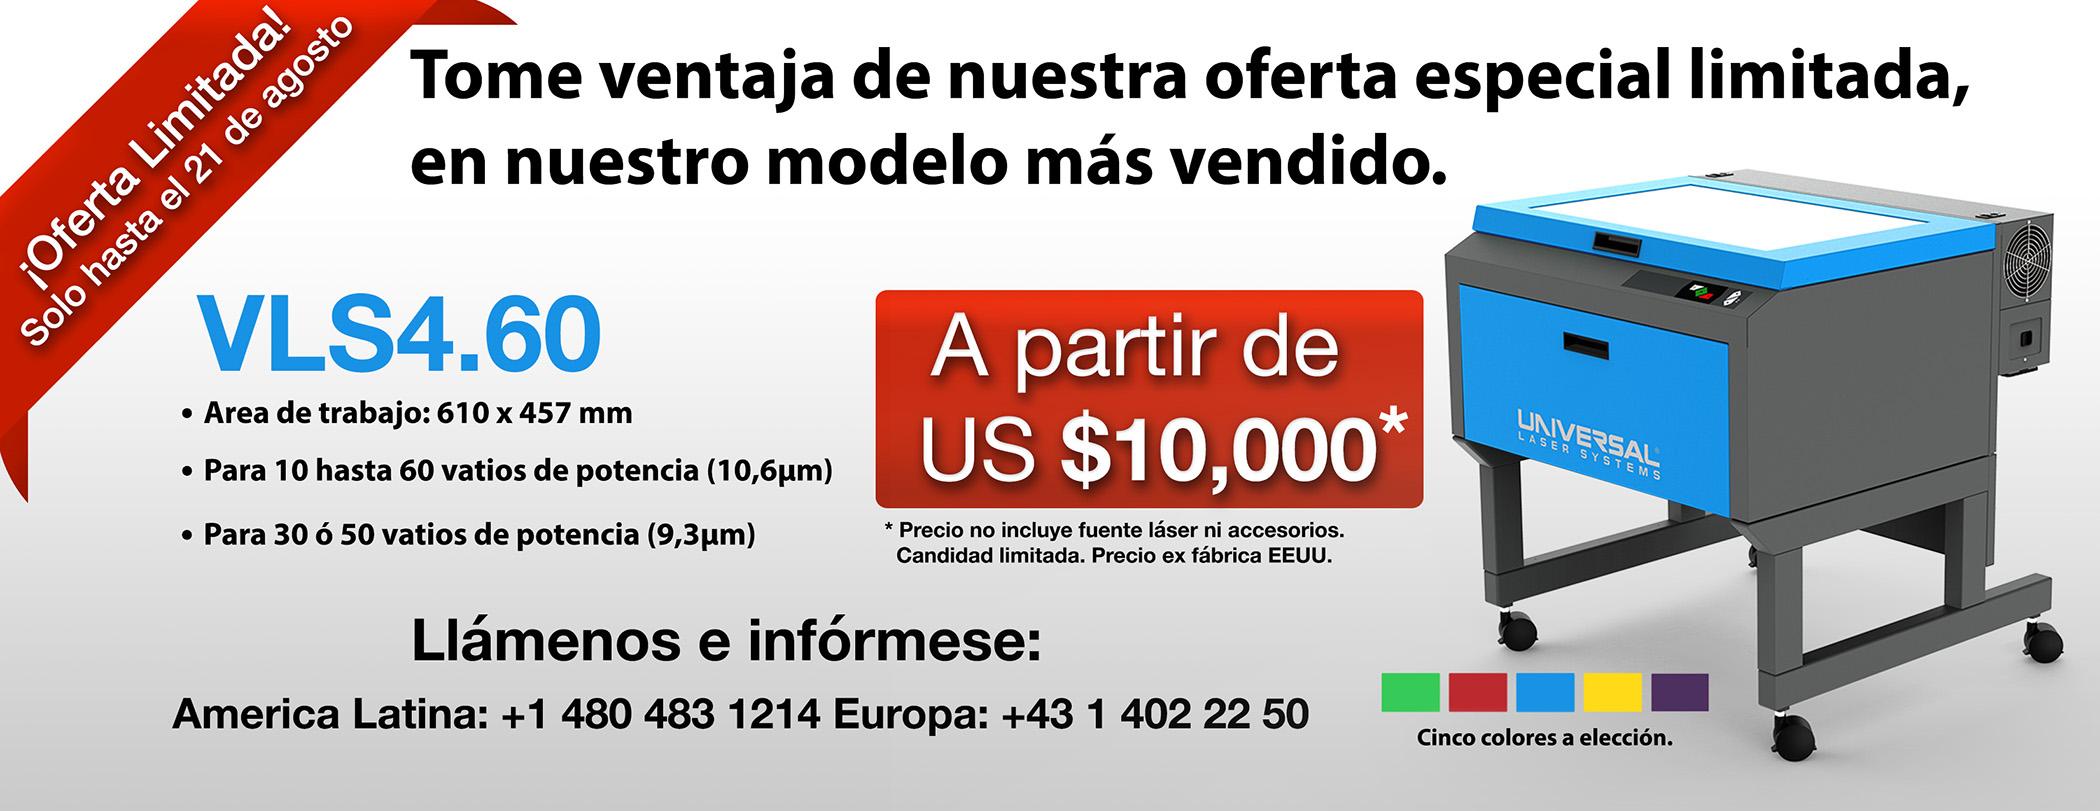 VLS Promo Spanish